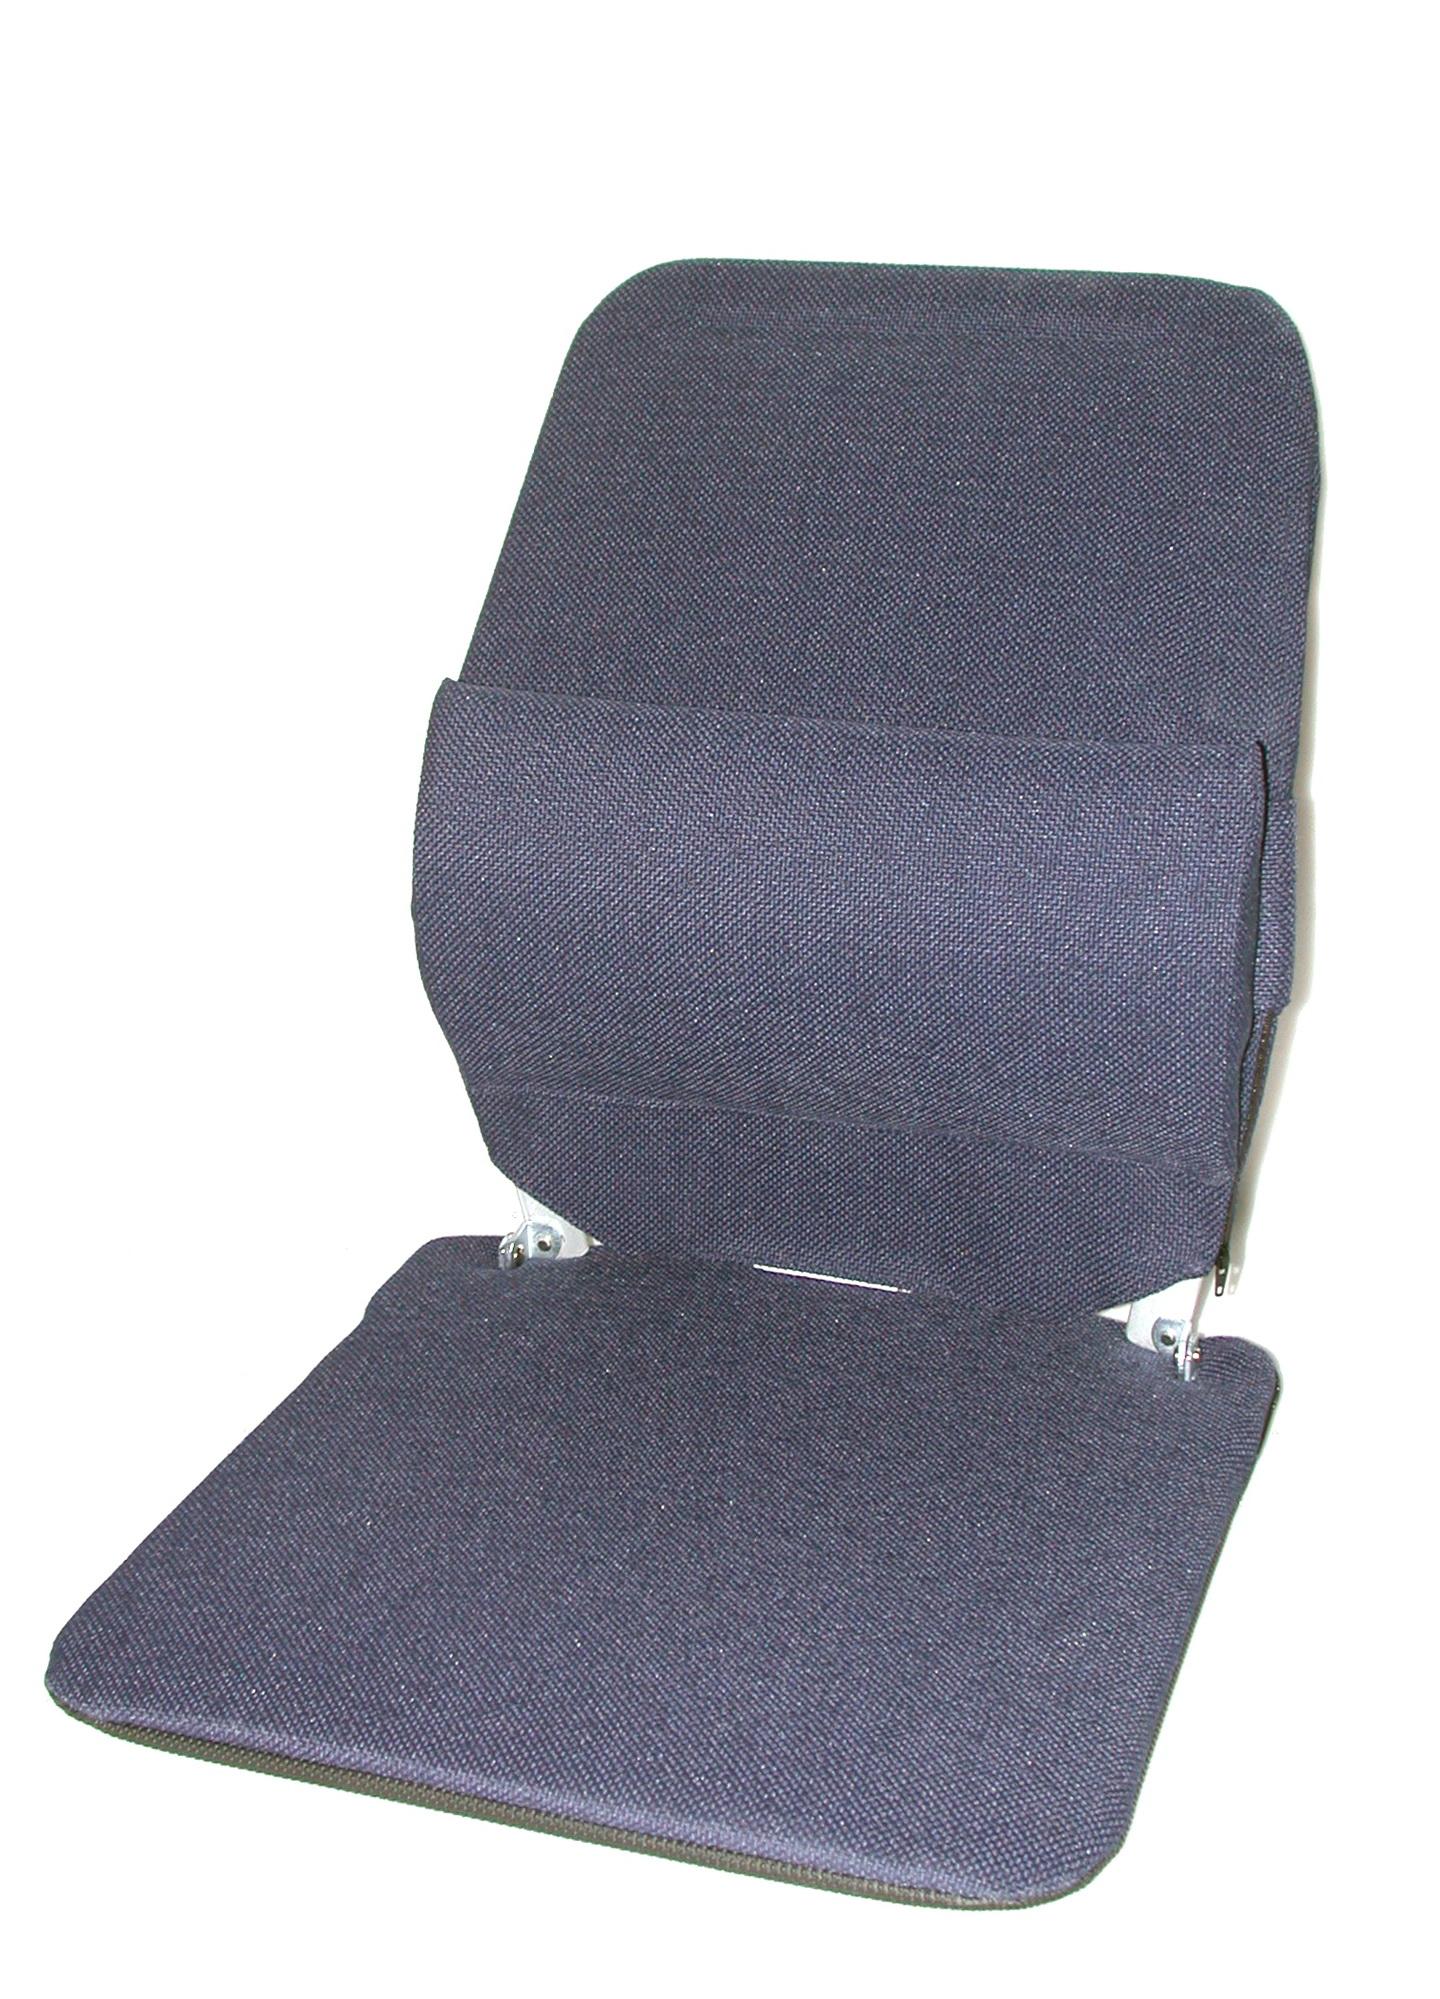 Back Pain Seat Cushion